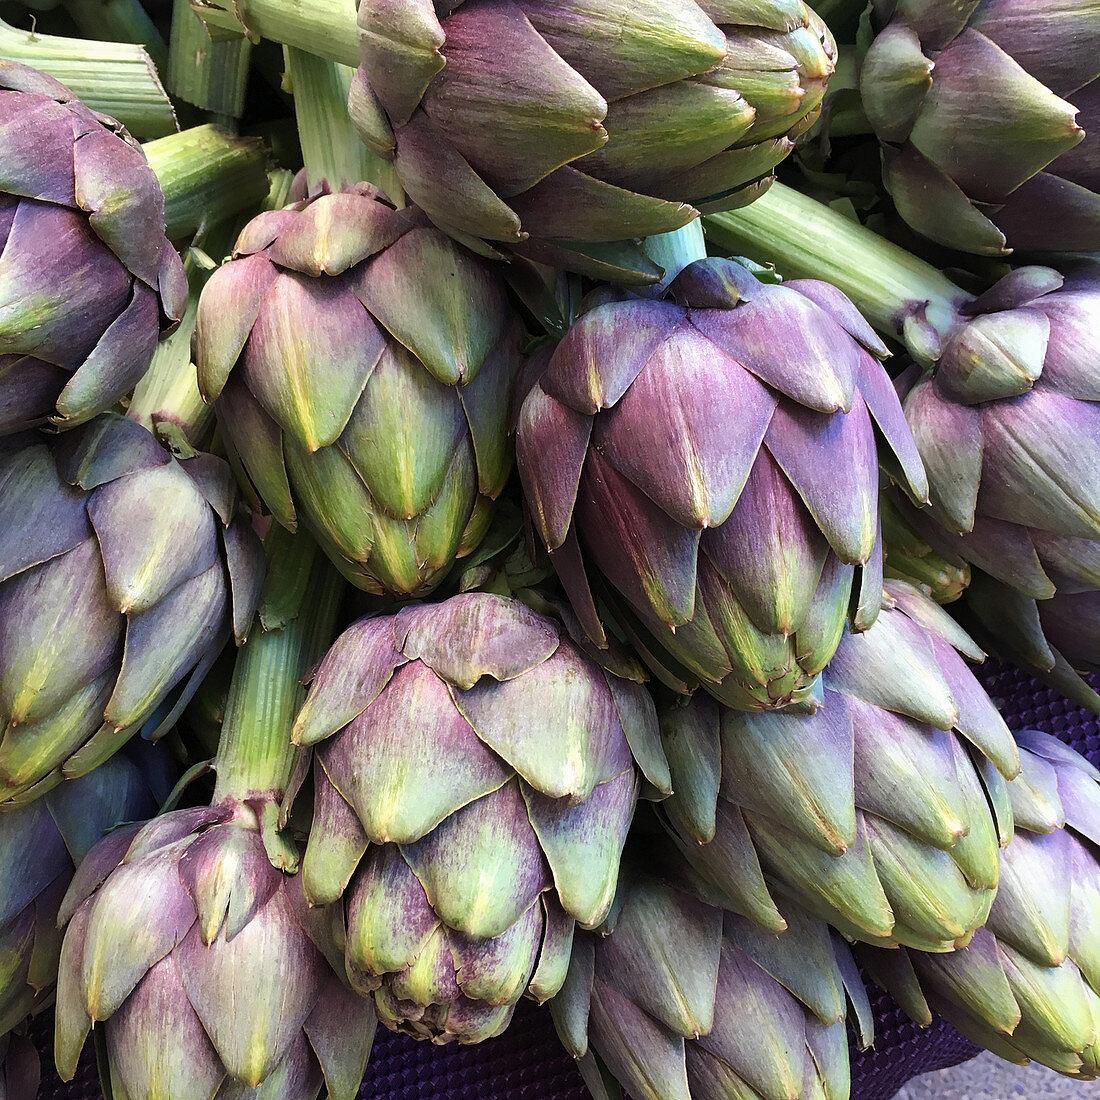 Purple Italian artichokes